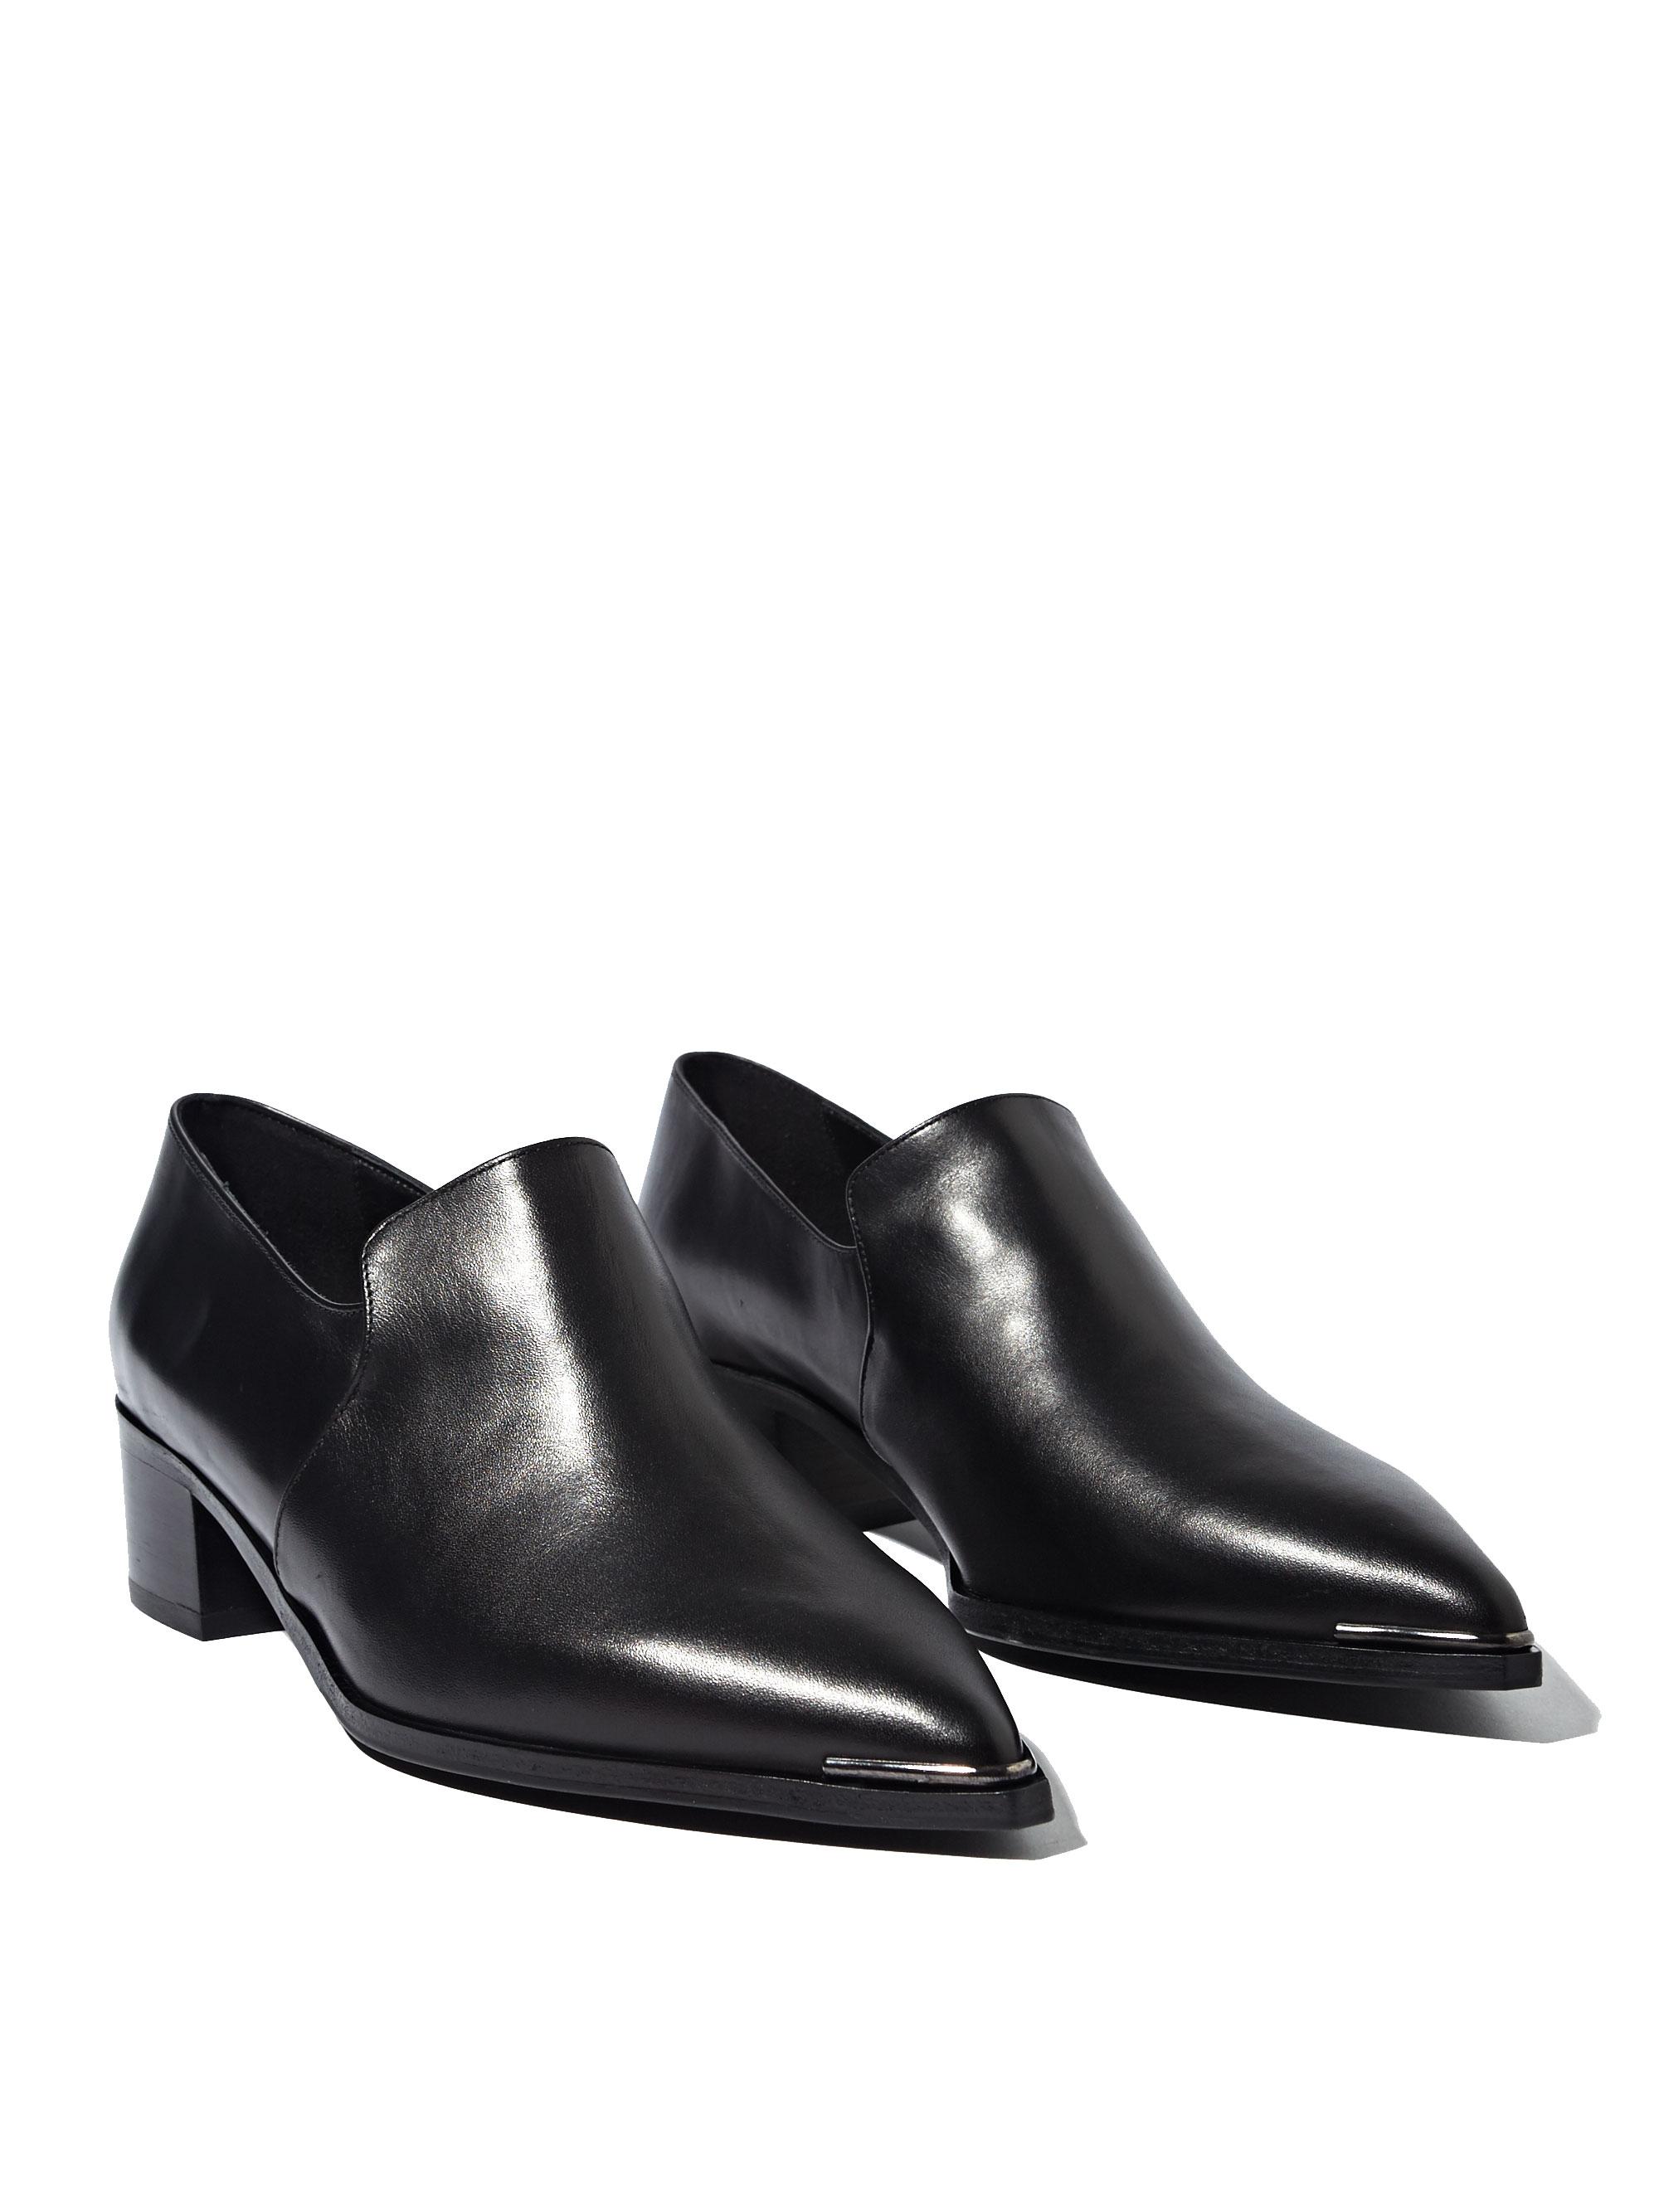 103e9153e5e Lyst - Acne Studios Womens Jaycee Lamb Leather Loafer Shoes in Black